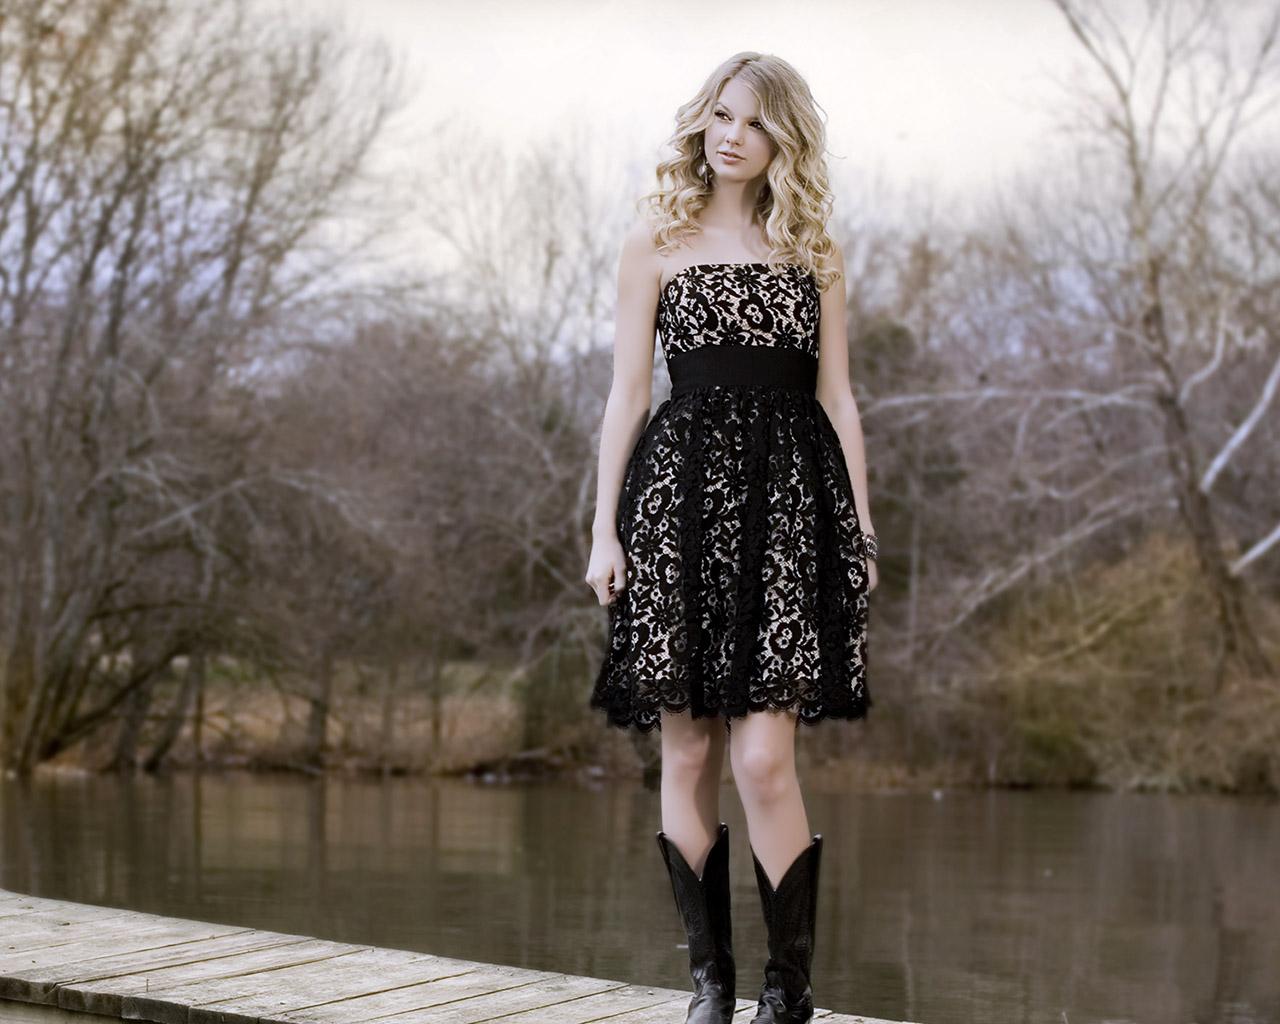 Taylor Swift Hd Wallpapers 2012